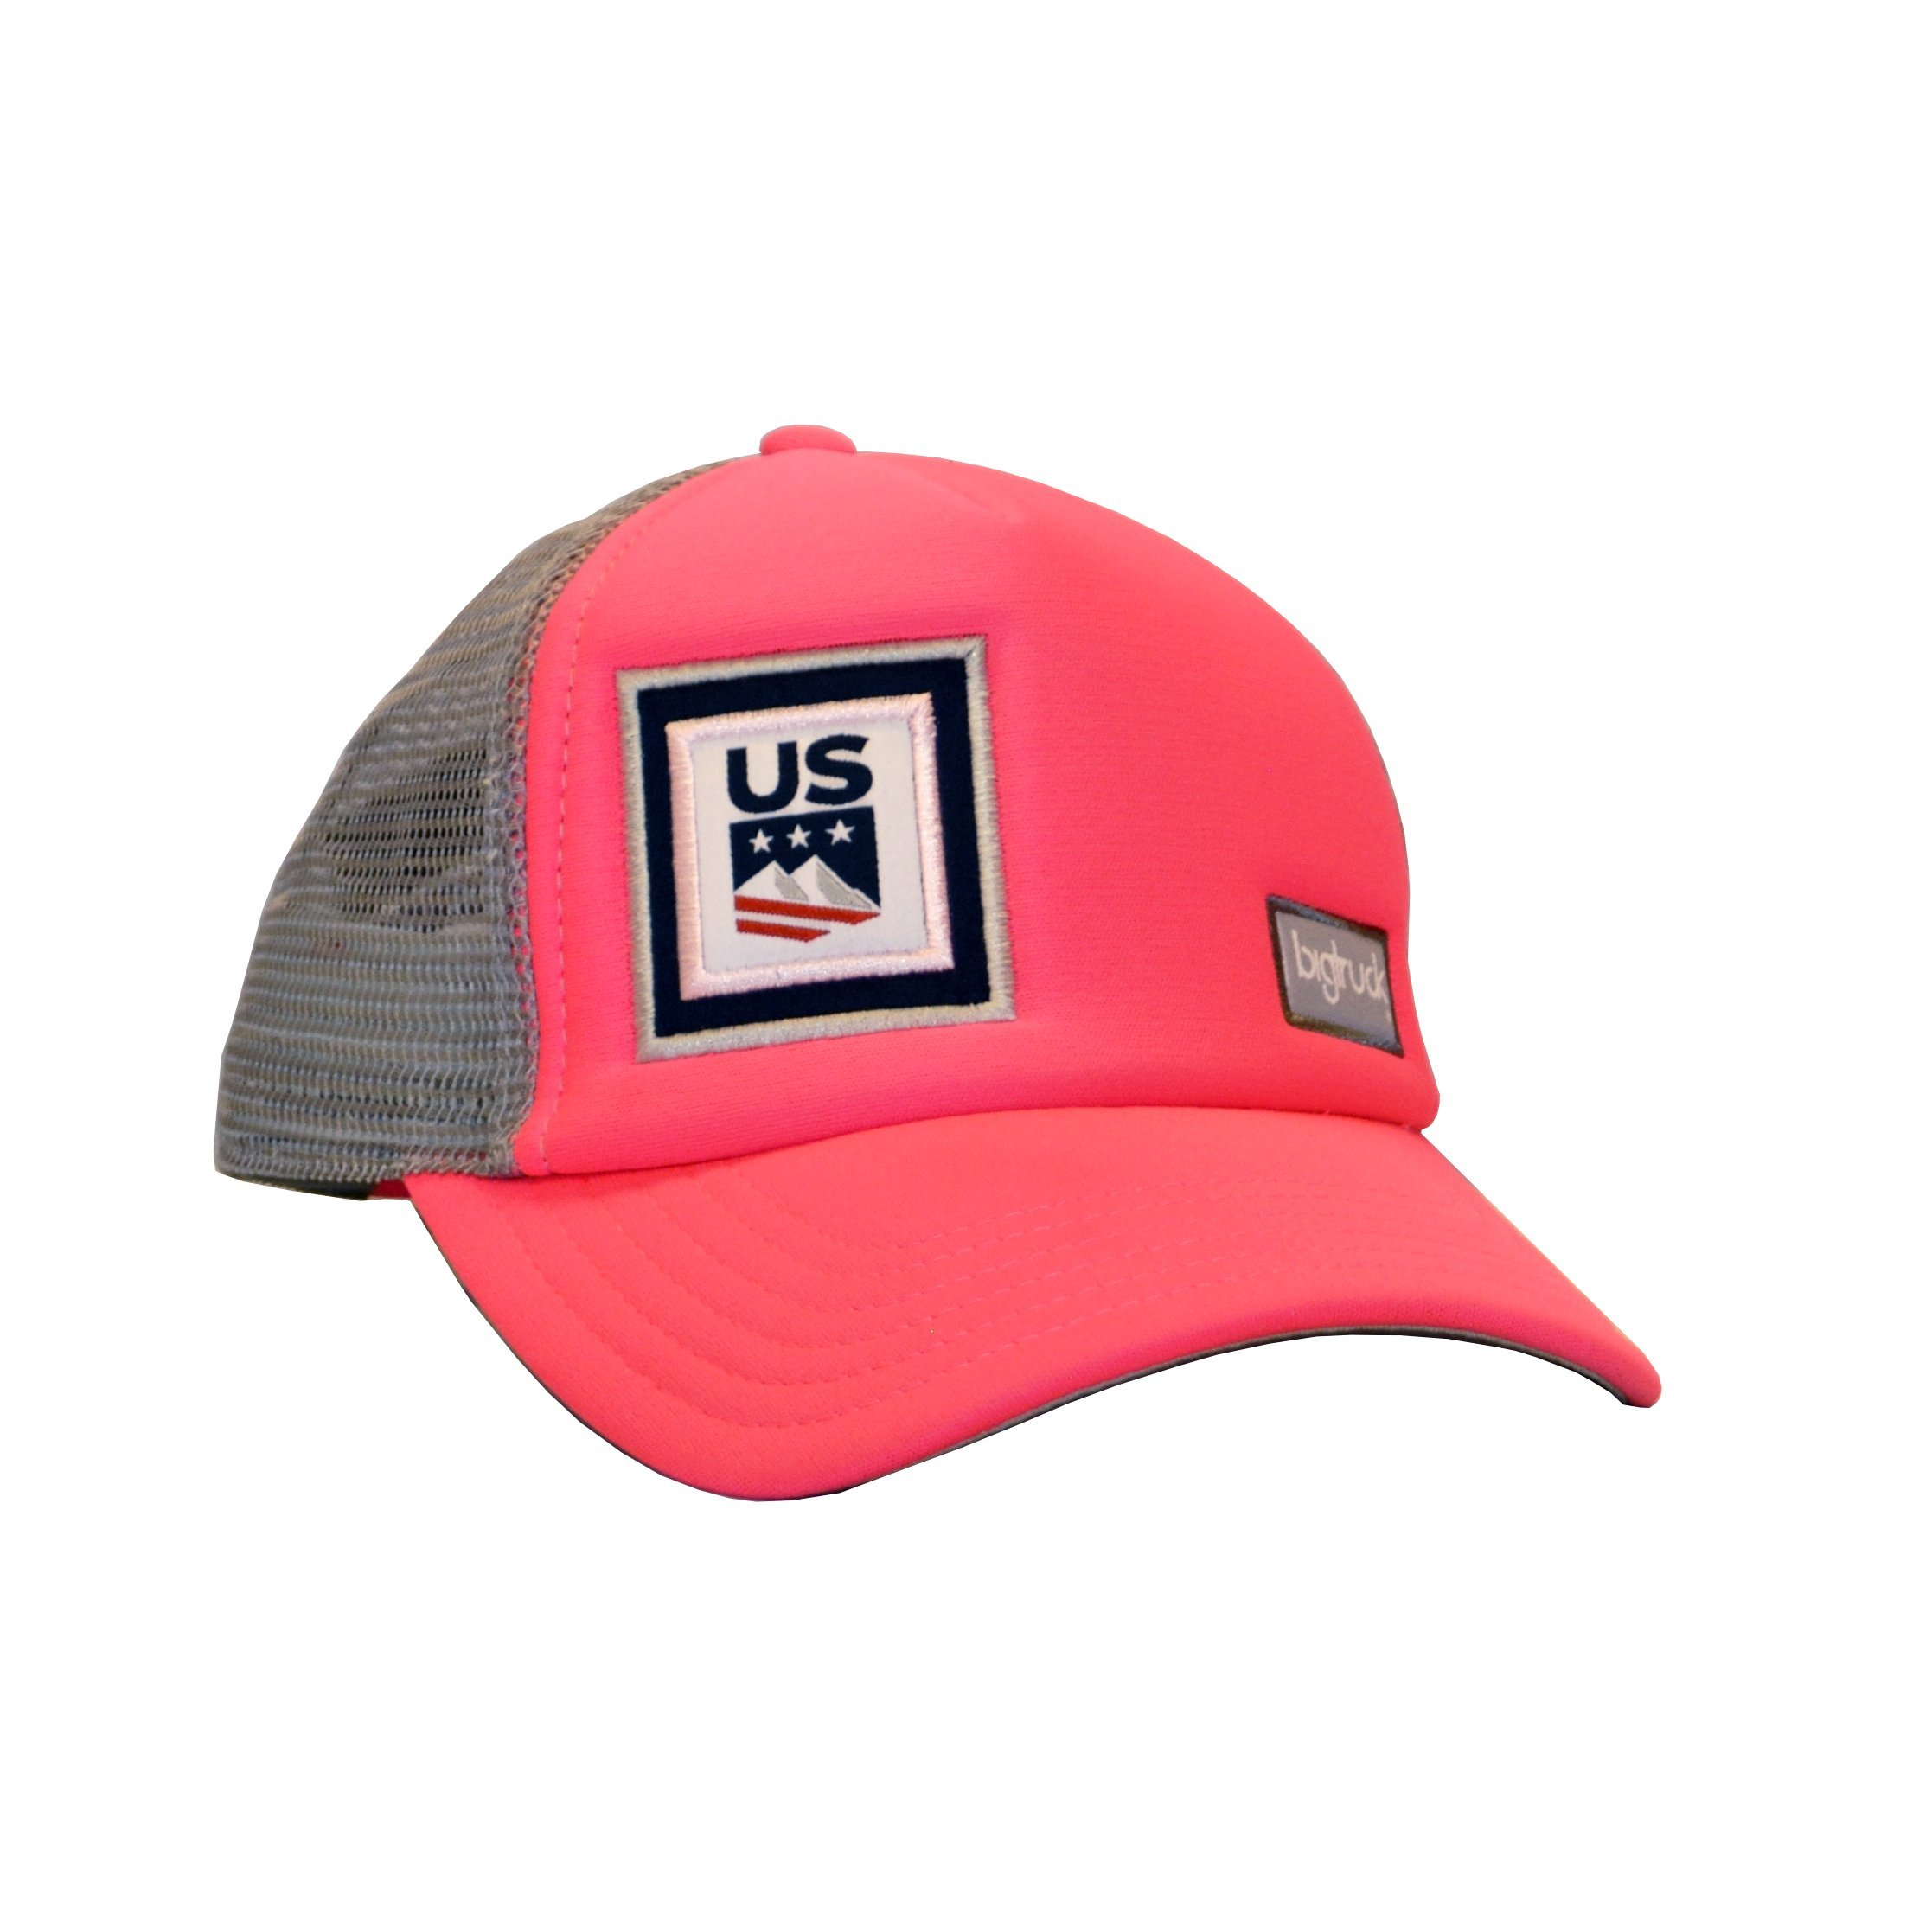 bigtruck USSA Original Youth Mesh Snapback Youth Trucker Hat, Pink